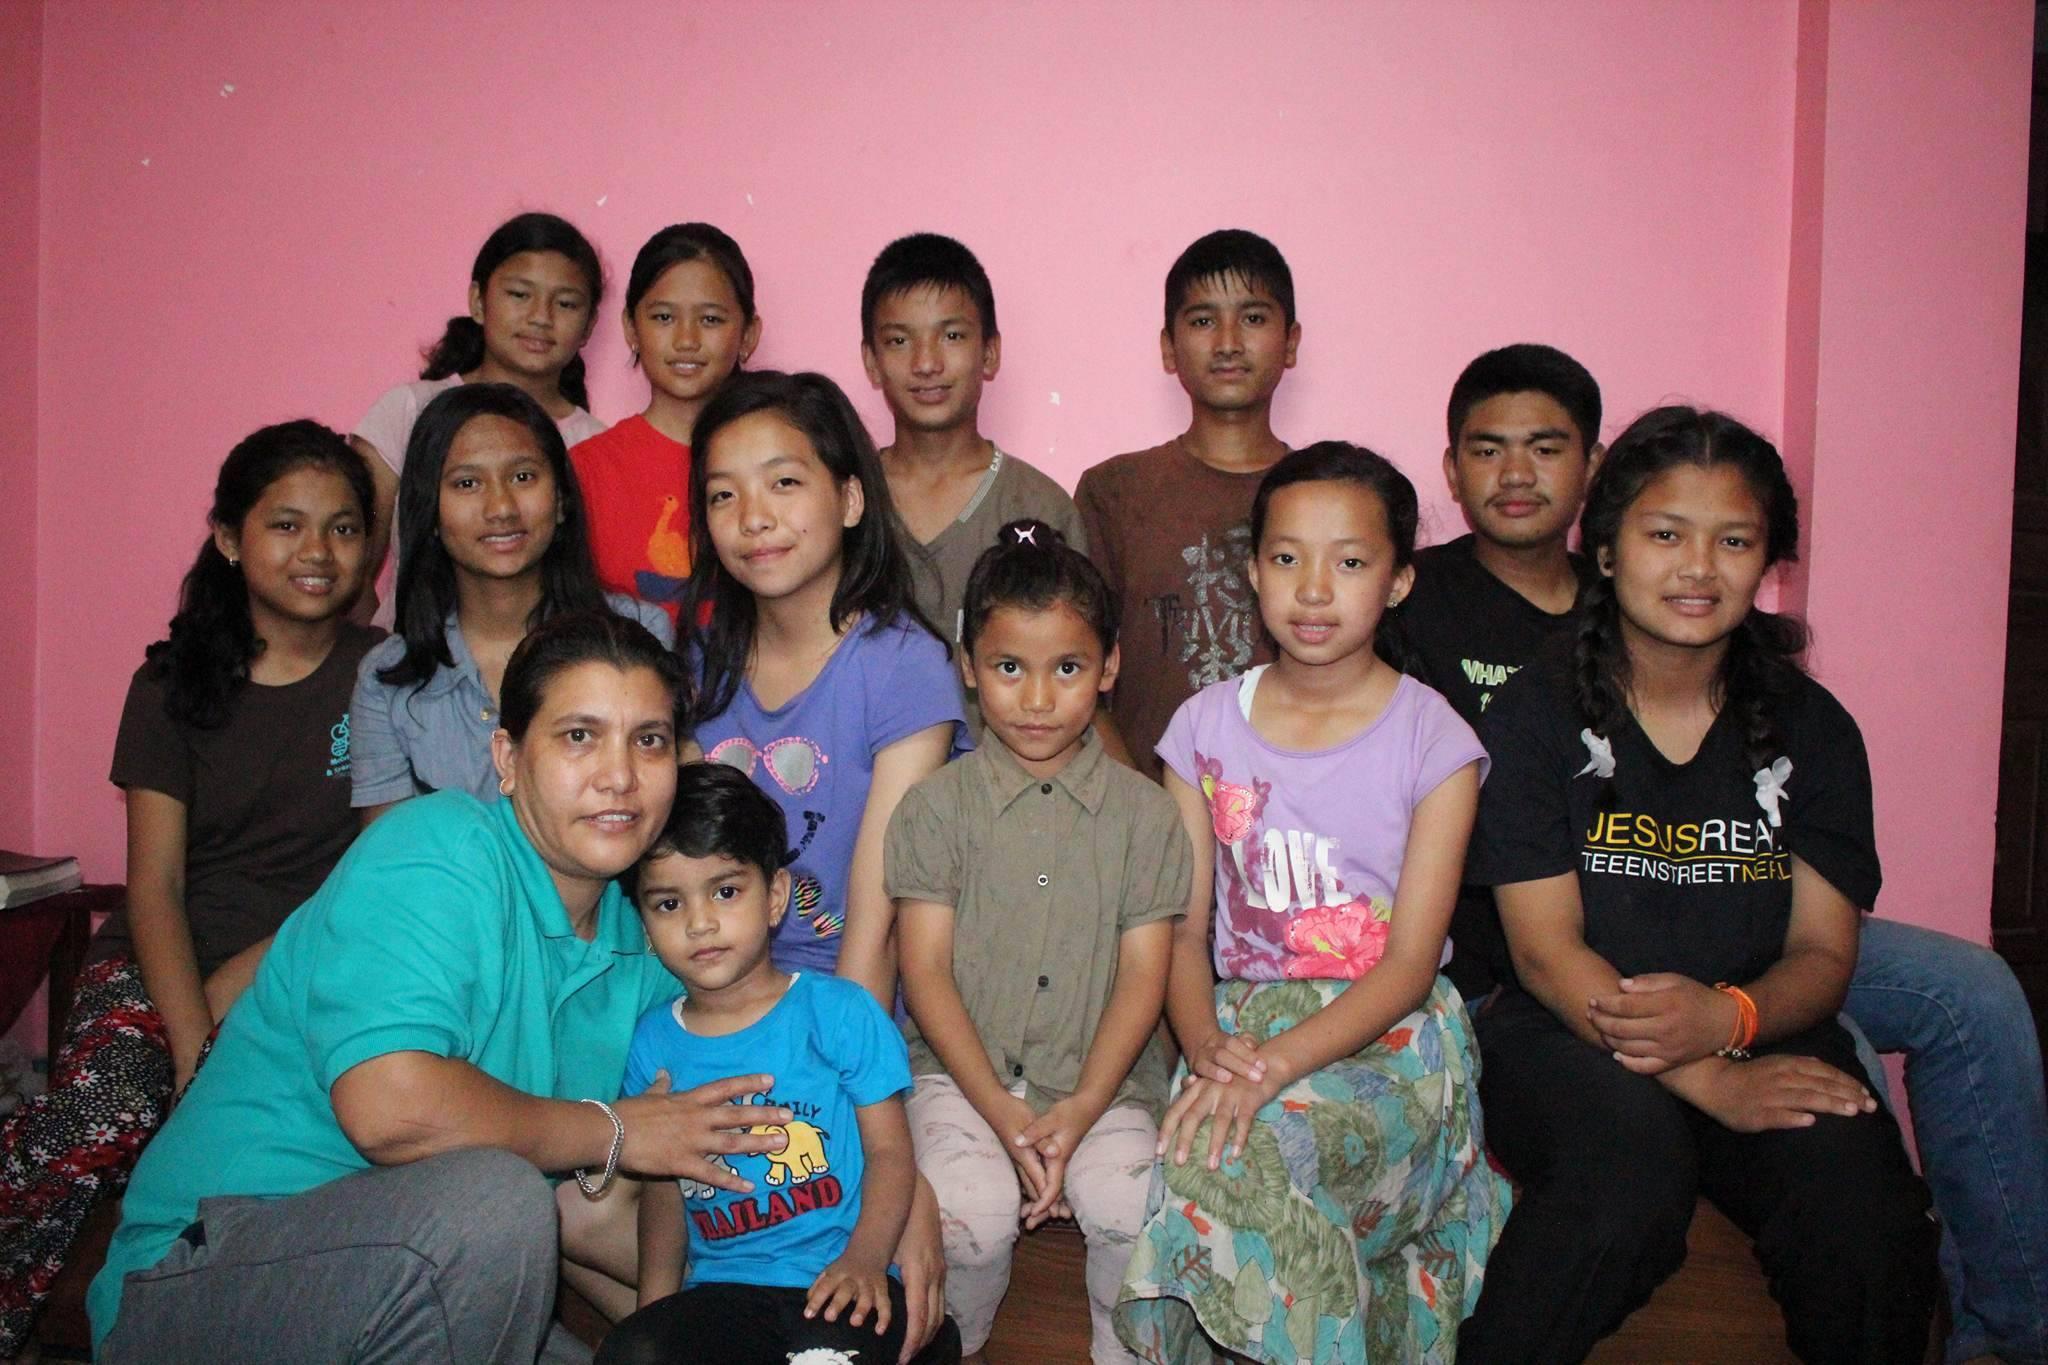 My Family Children's Home